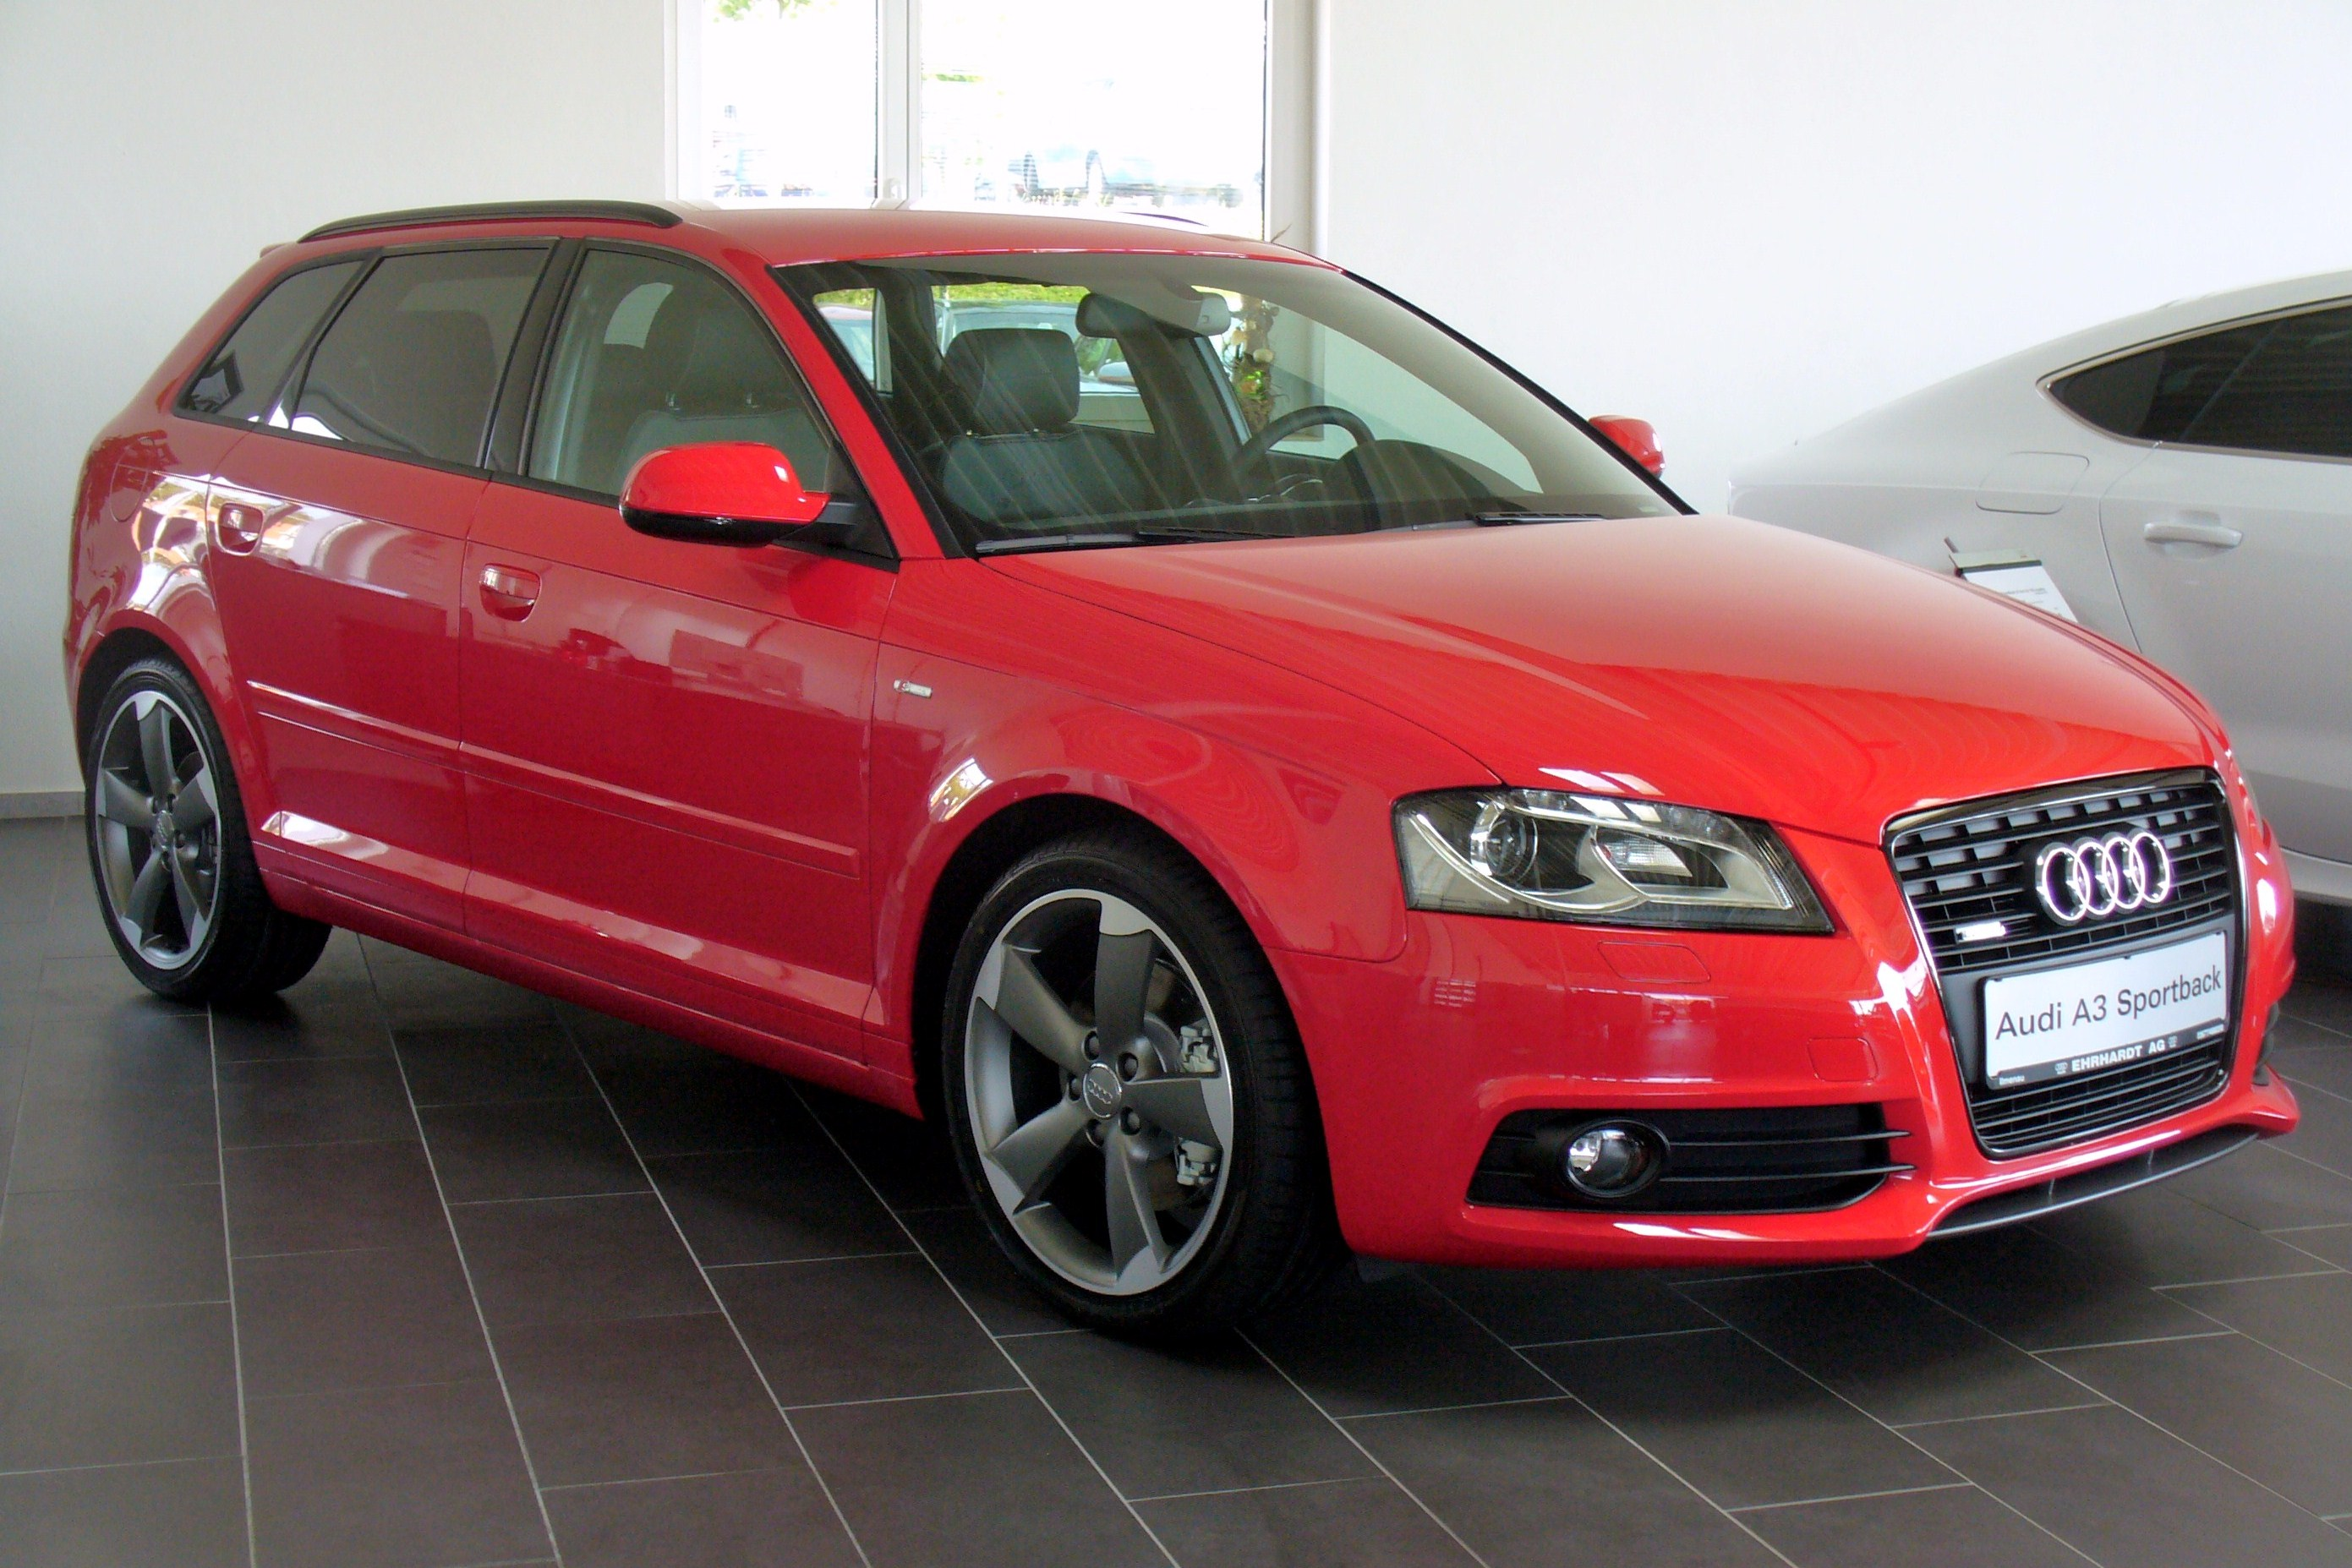 Audi a3 2.0 tdi sportback quattro